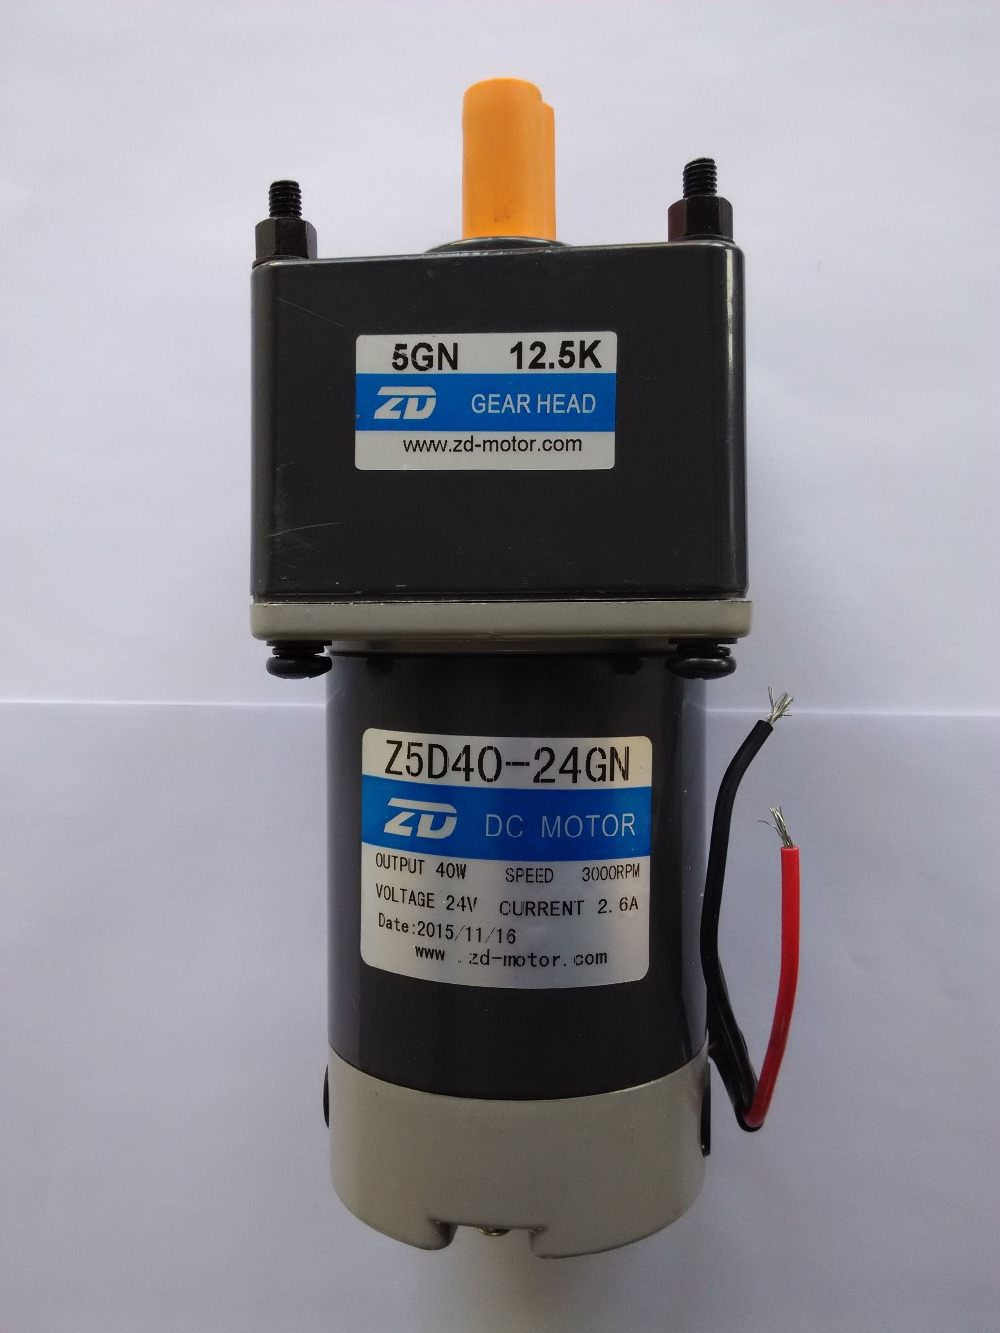 40W 70mm 24v Micro DC gear motors DC brush gear motor send to China mainland agent Ratio 12.5:1 20 pcs in a parcel miro DC motor 030 micro motors 2 pcs